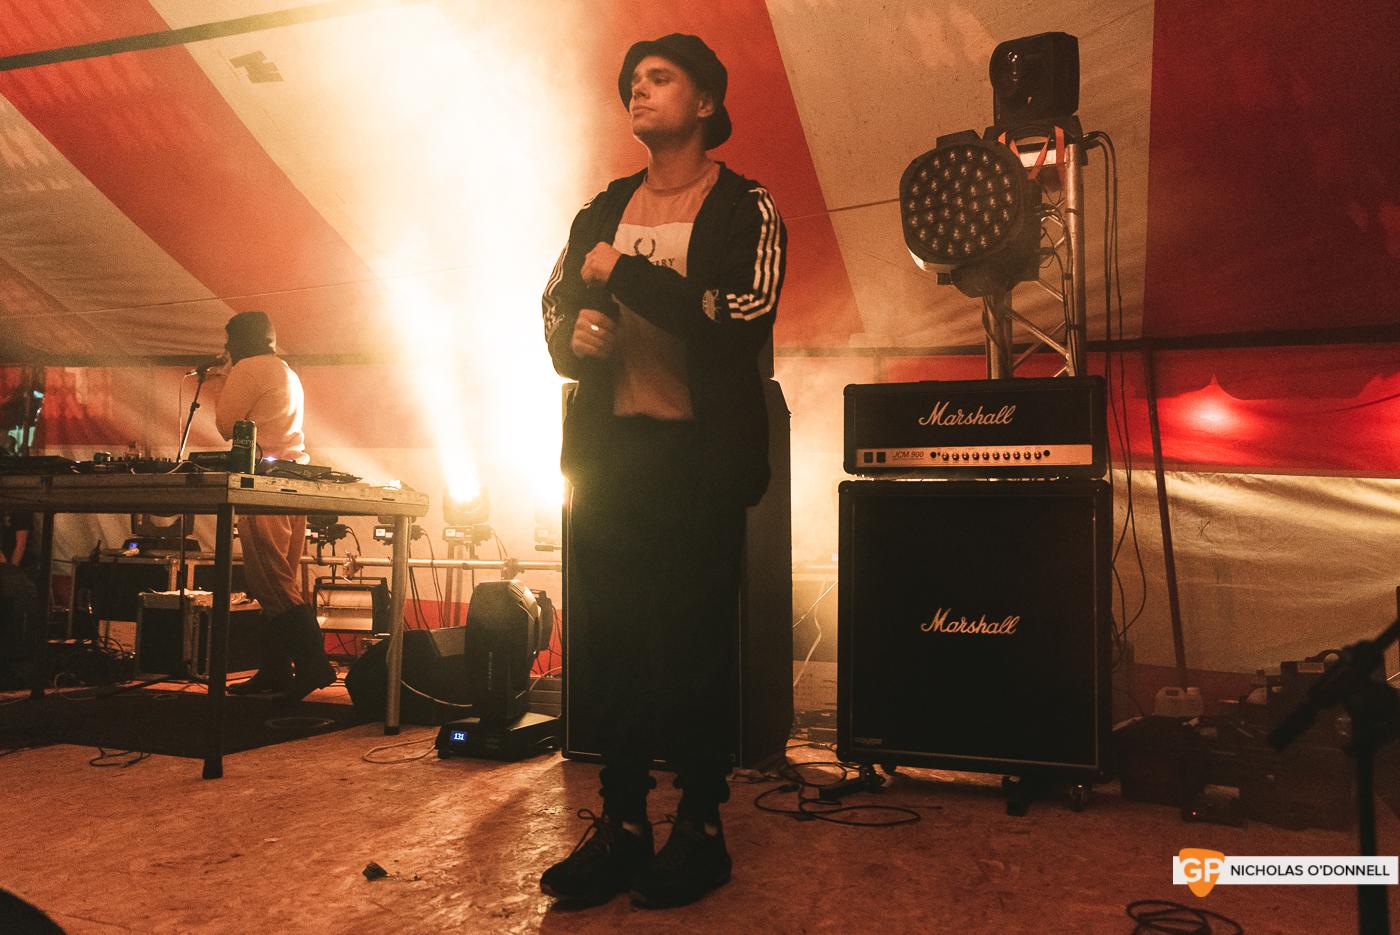 KNEECAP performing on the Dimestore stage at KnockanStockan 19.